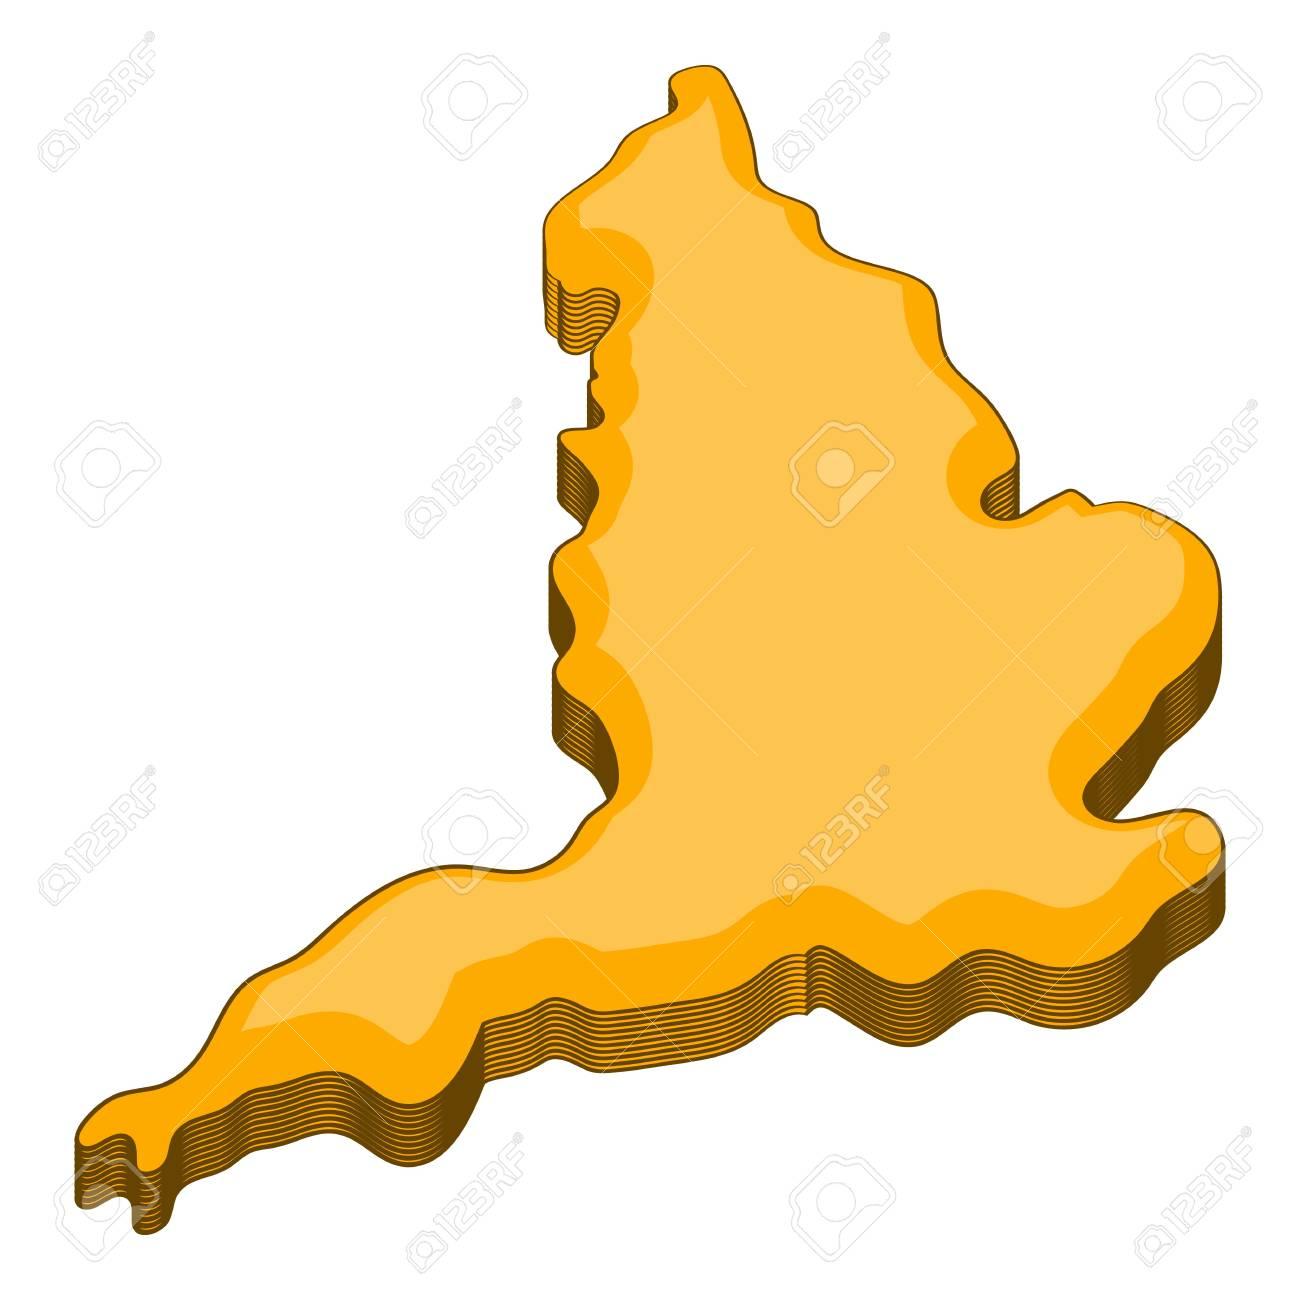 Map Of United Kingdom Icon Cartoon Illustration Of Map Of United